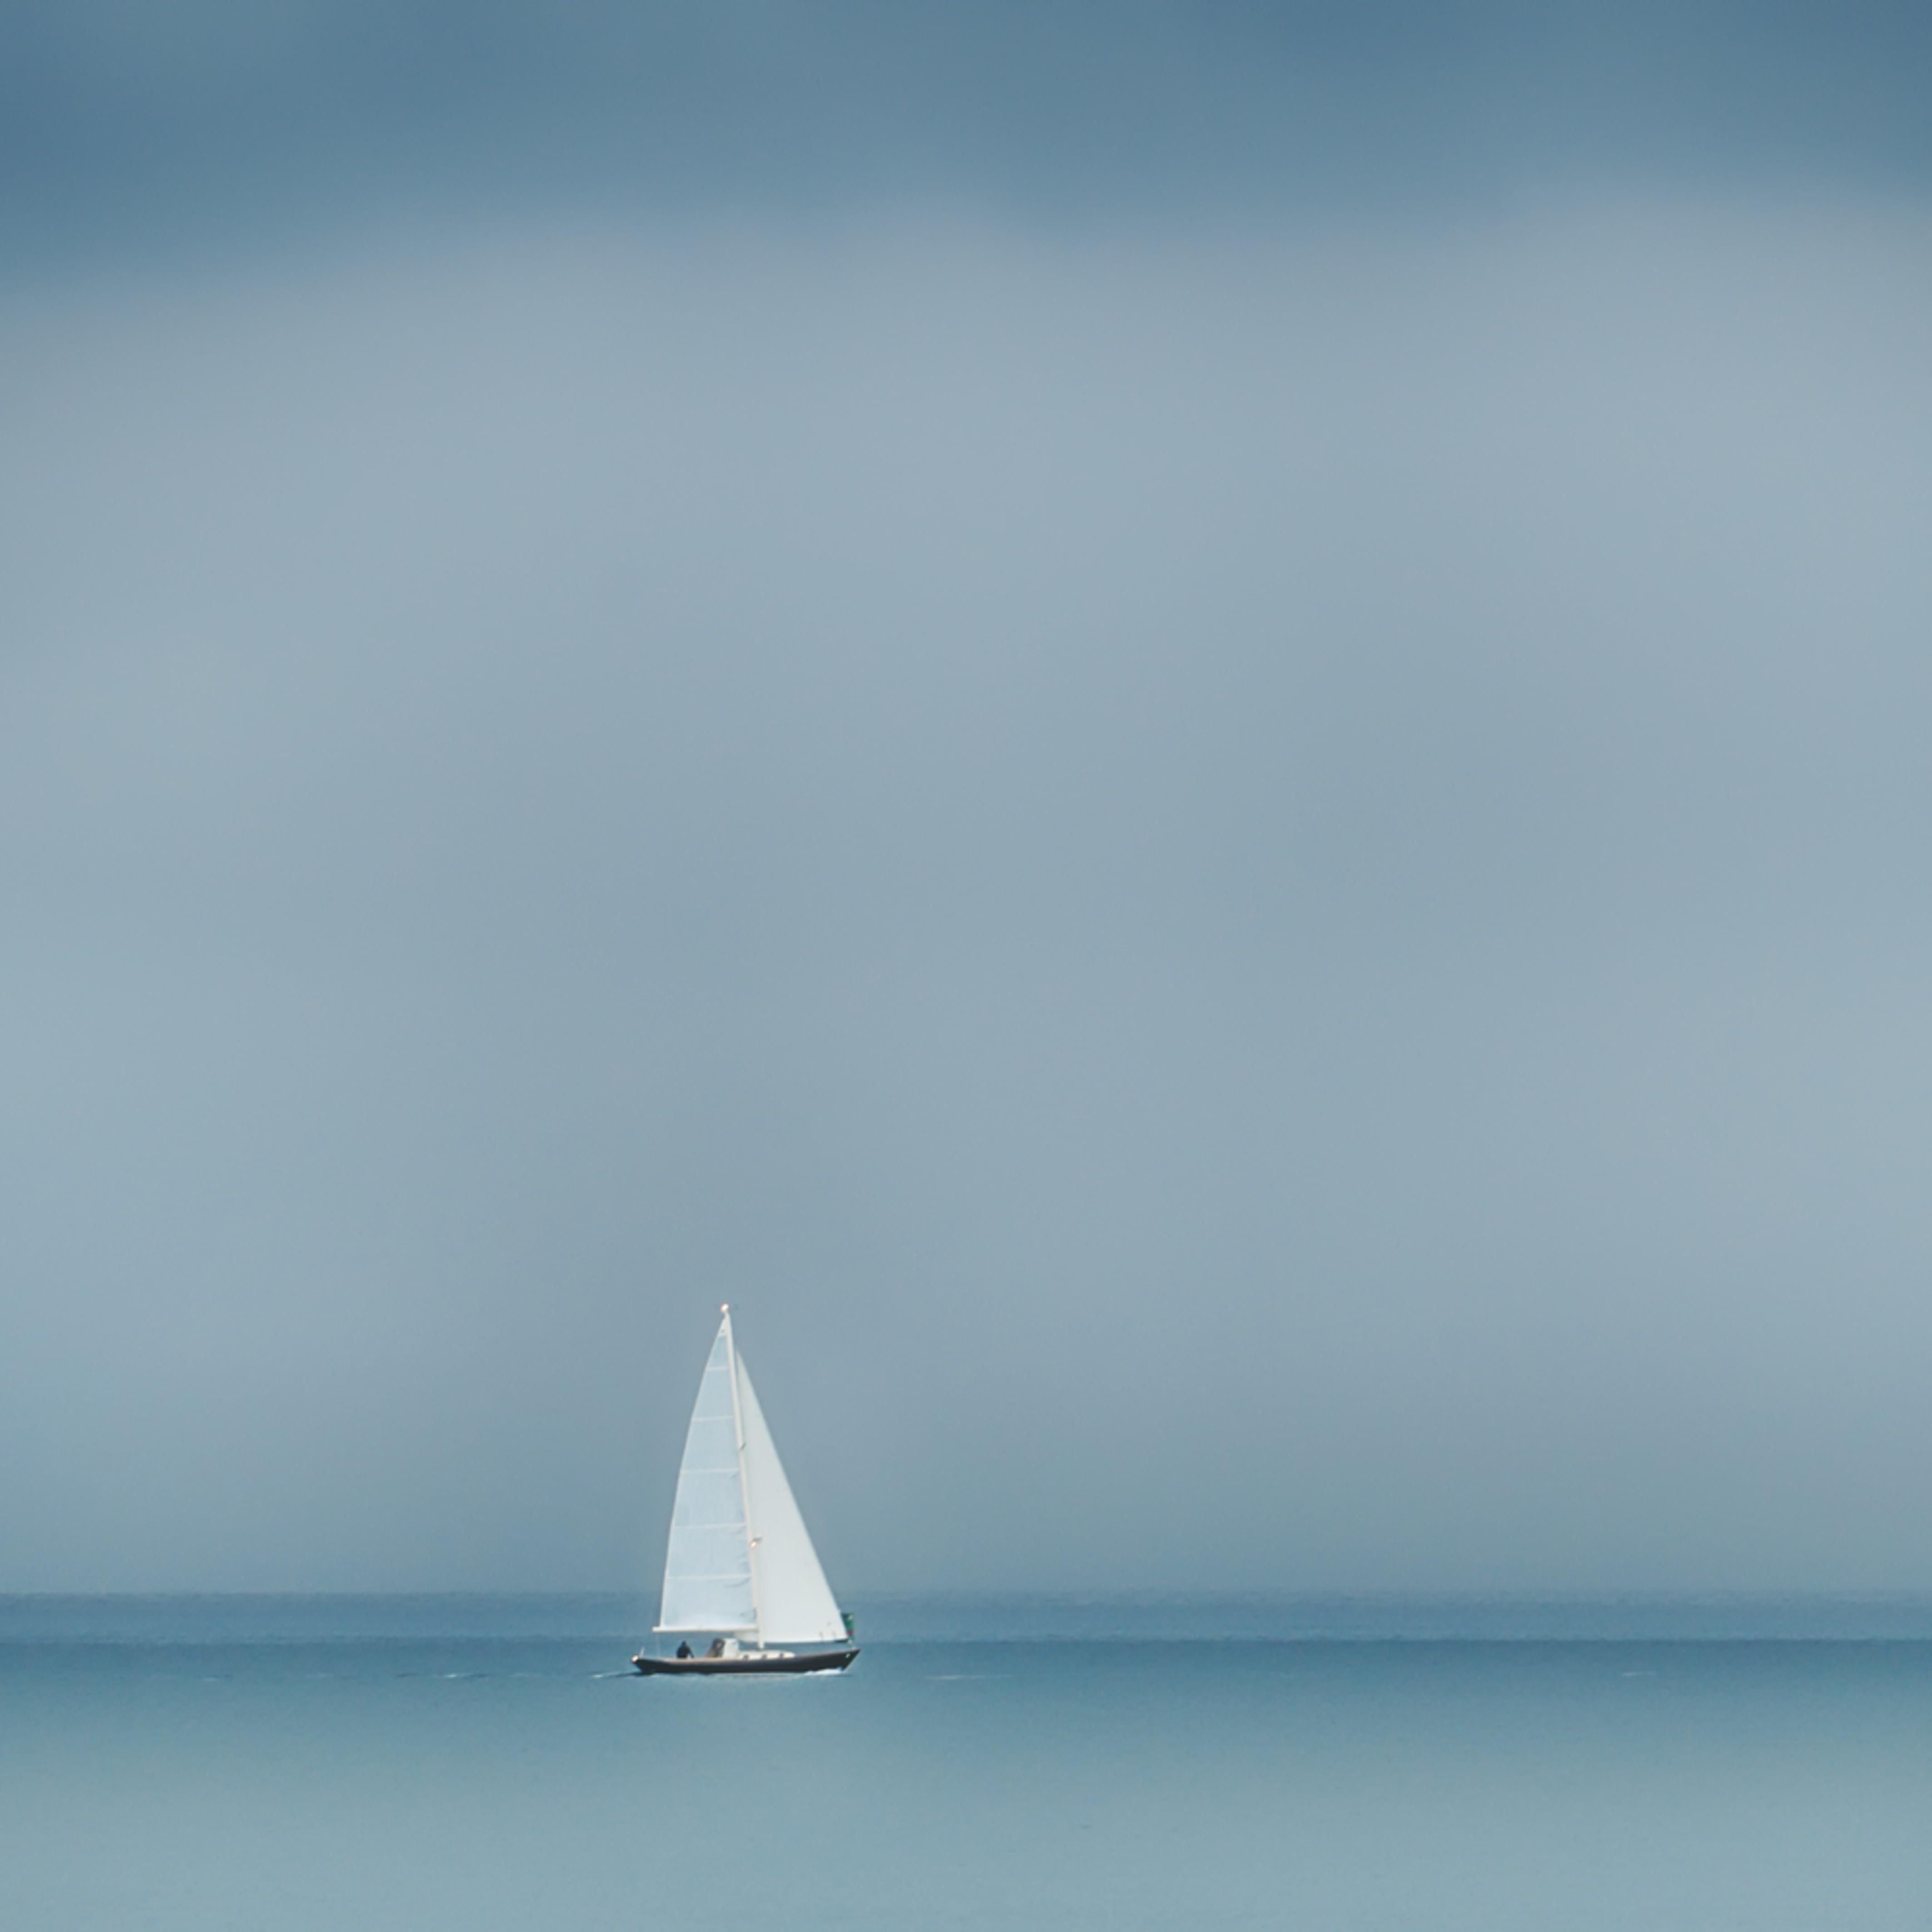 Sailing single handed vt38tj